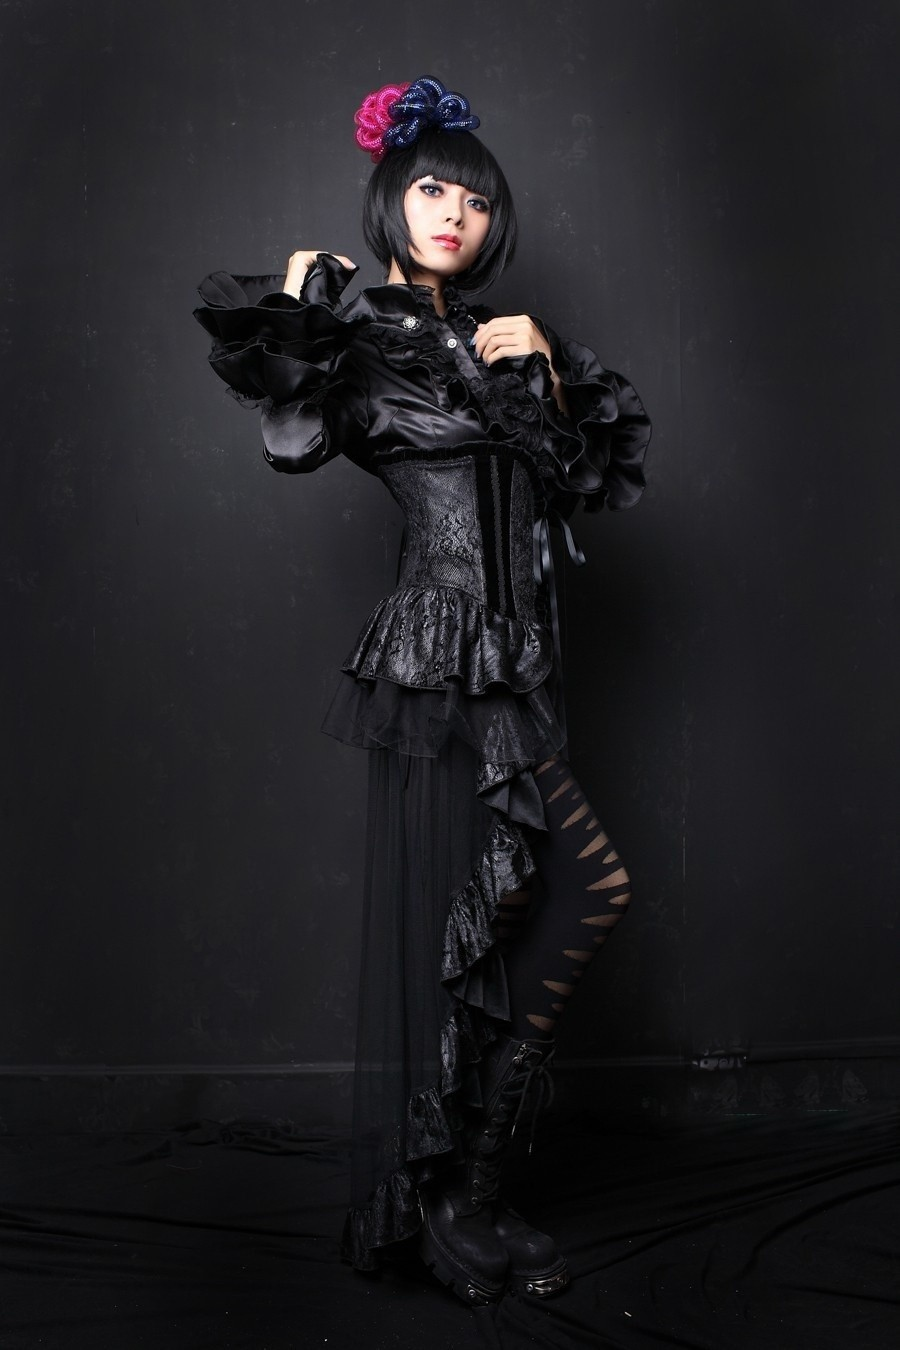 Corset met asymmetrische gothic rok